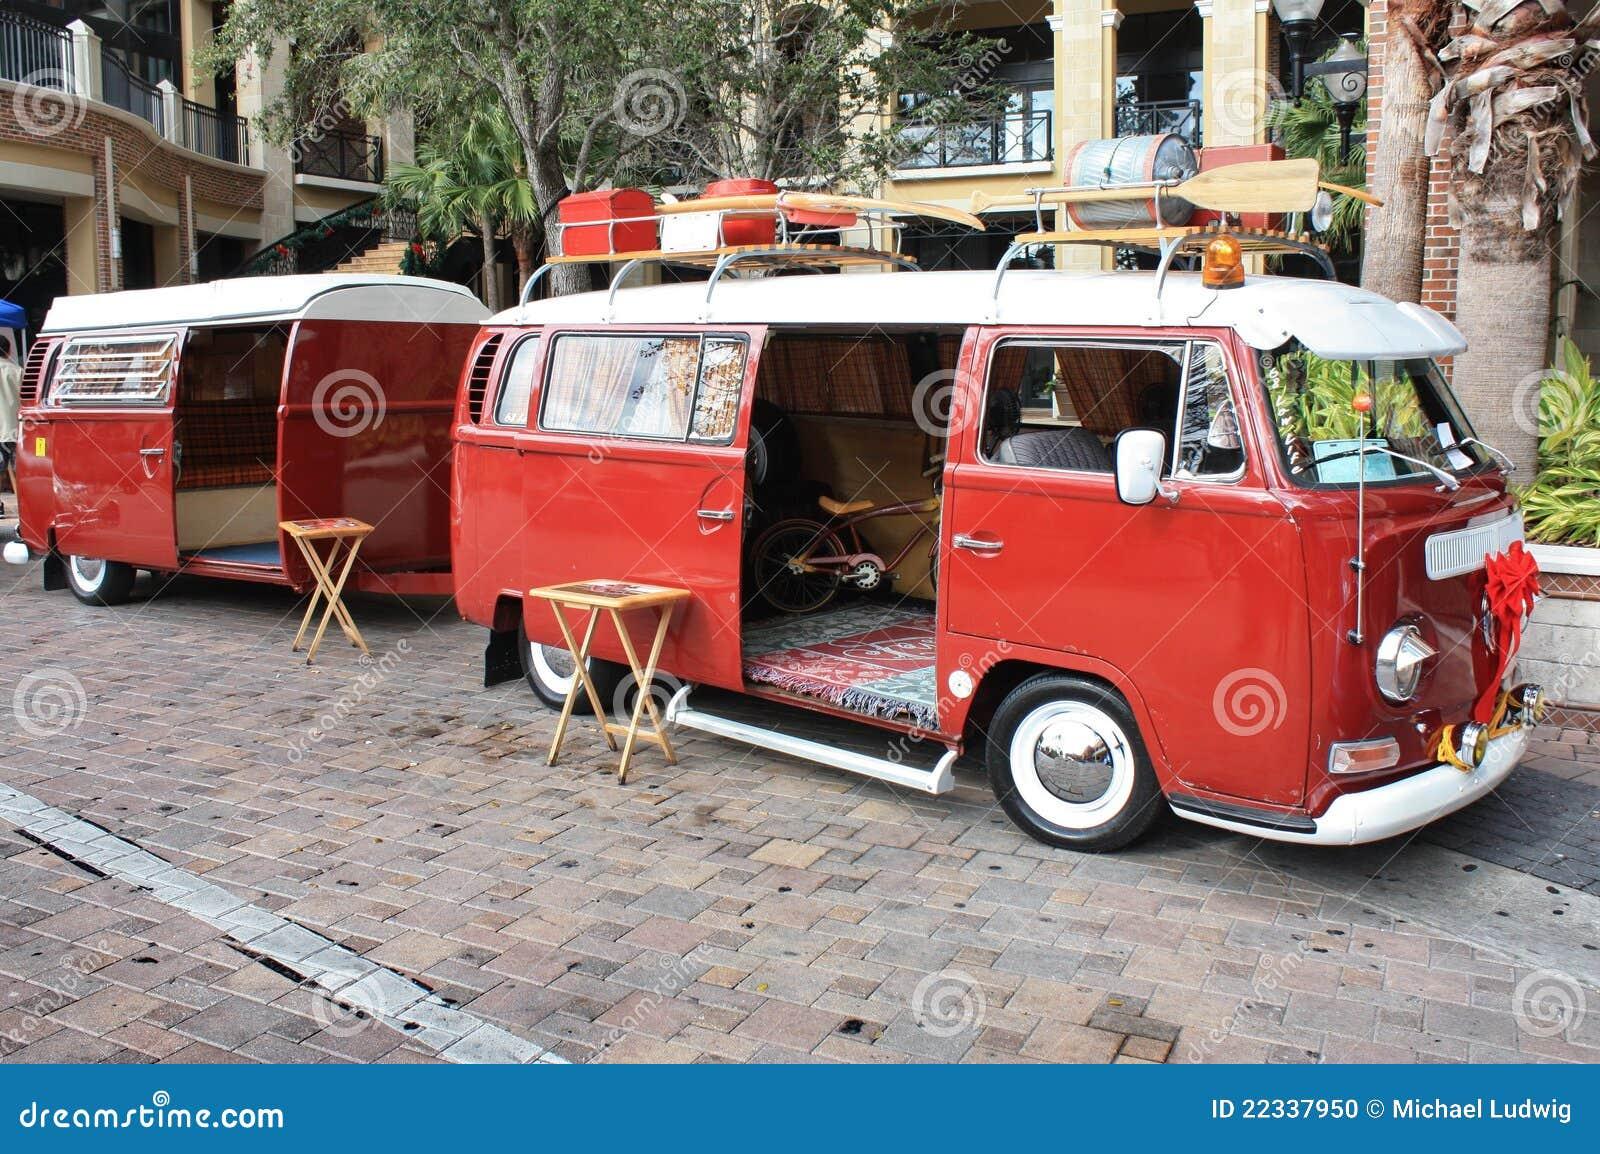 Vw transporter interior | VW Bus | Pinterest | Interiors